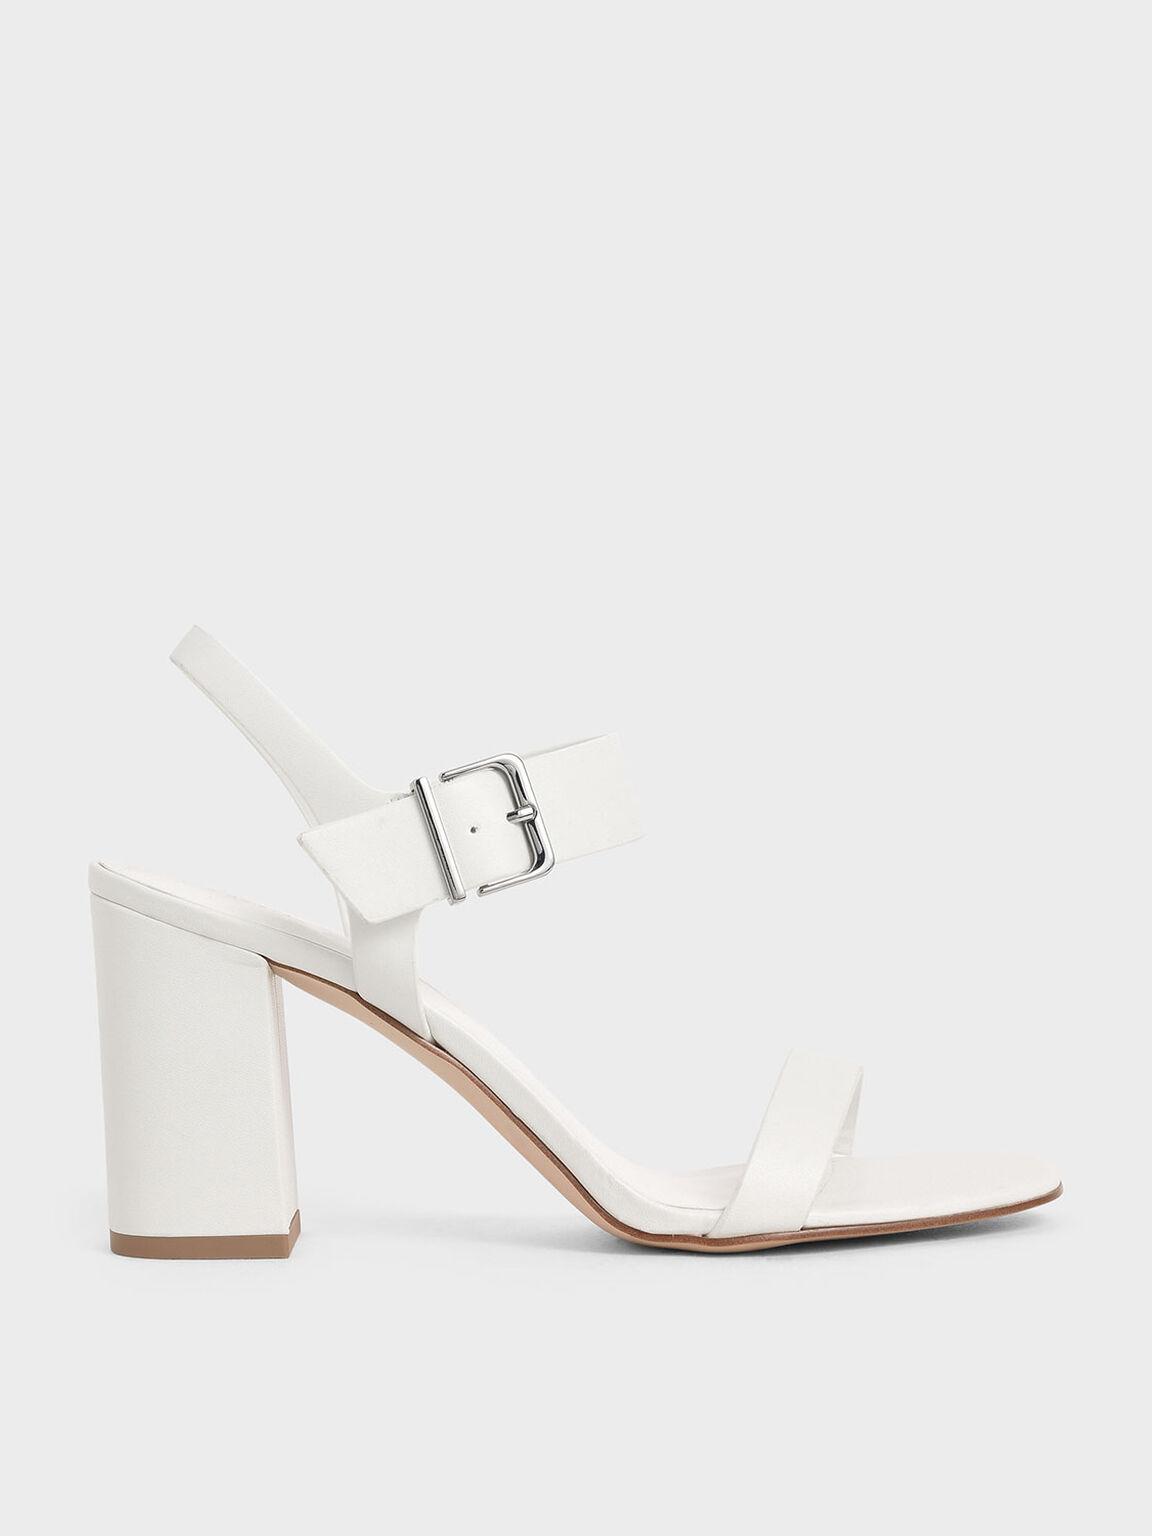 一字高跟涼鞋, 白色, hi-res